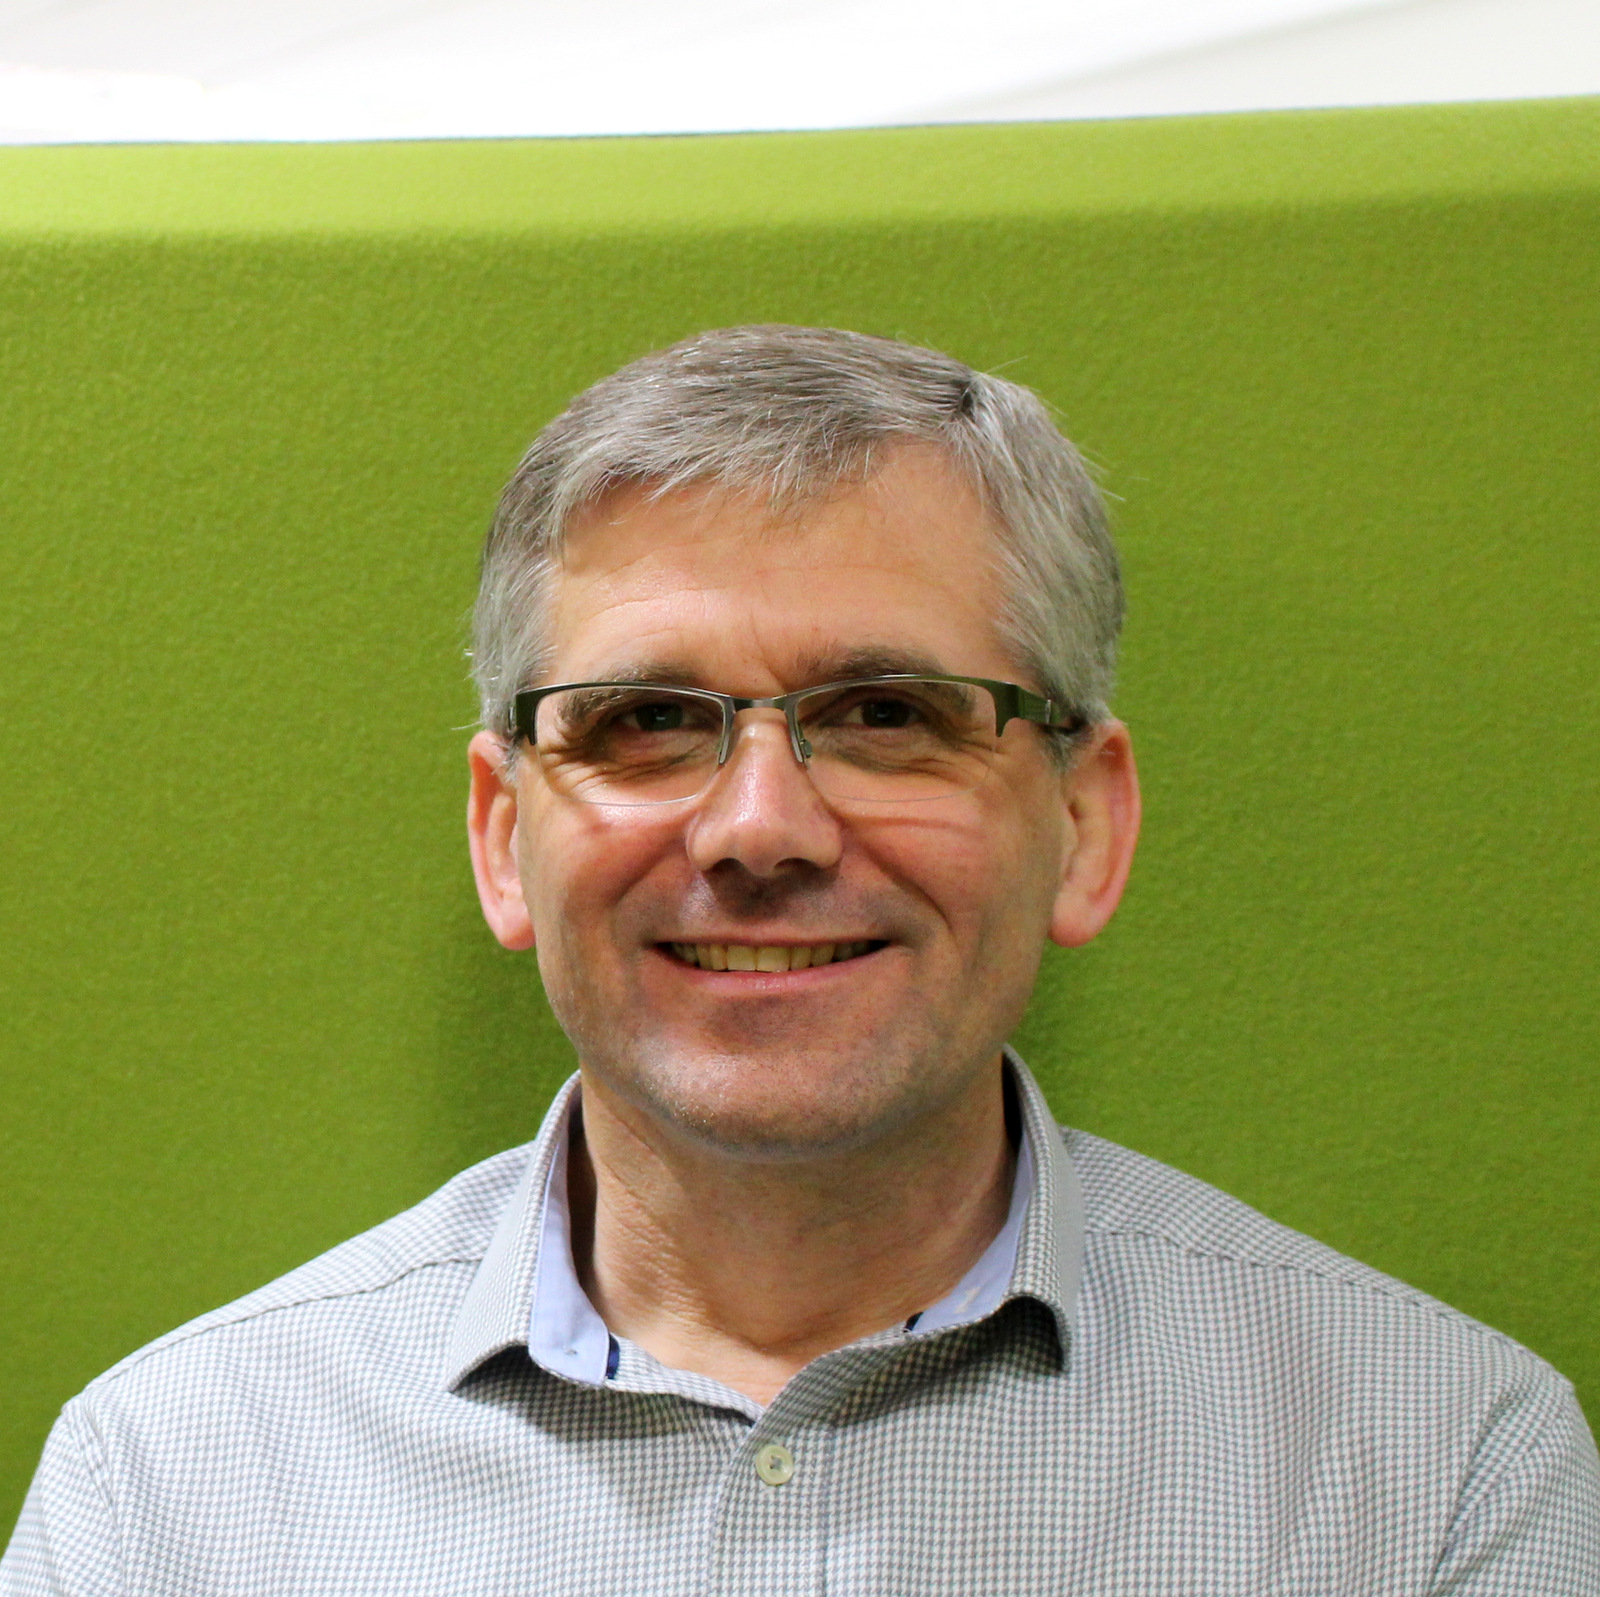 Head of Operations Tim Hibbert